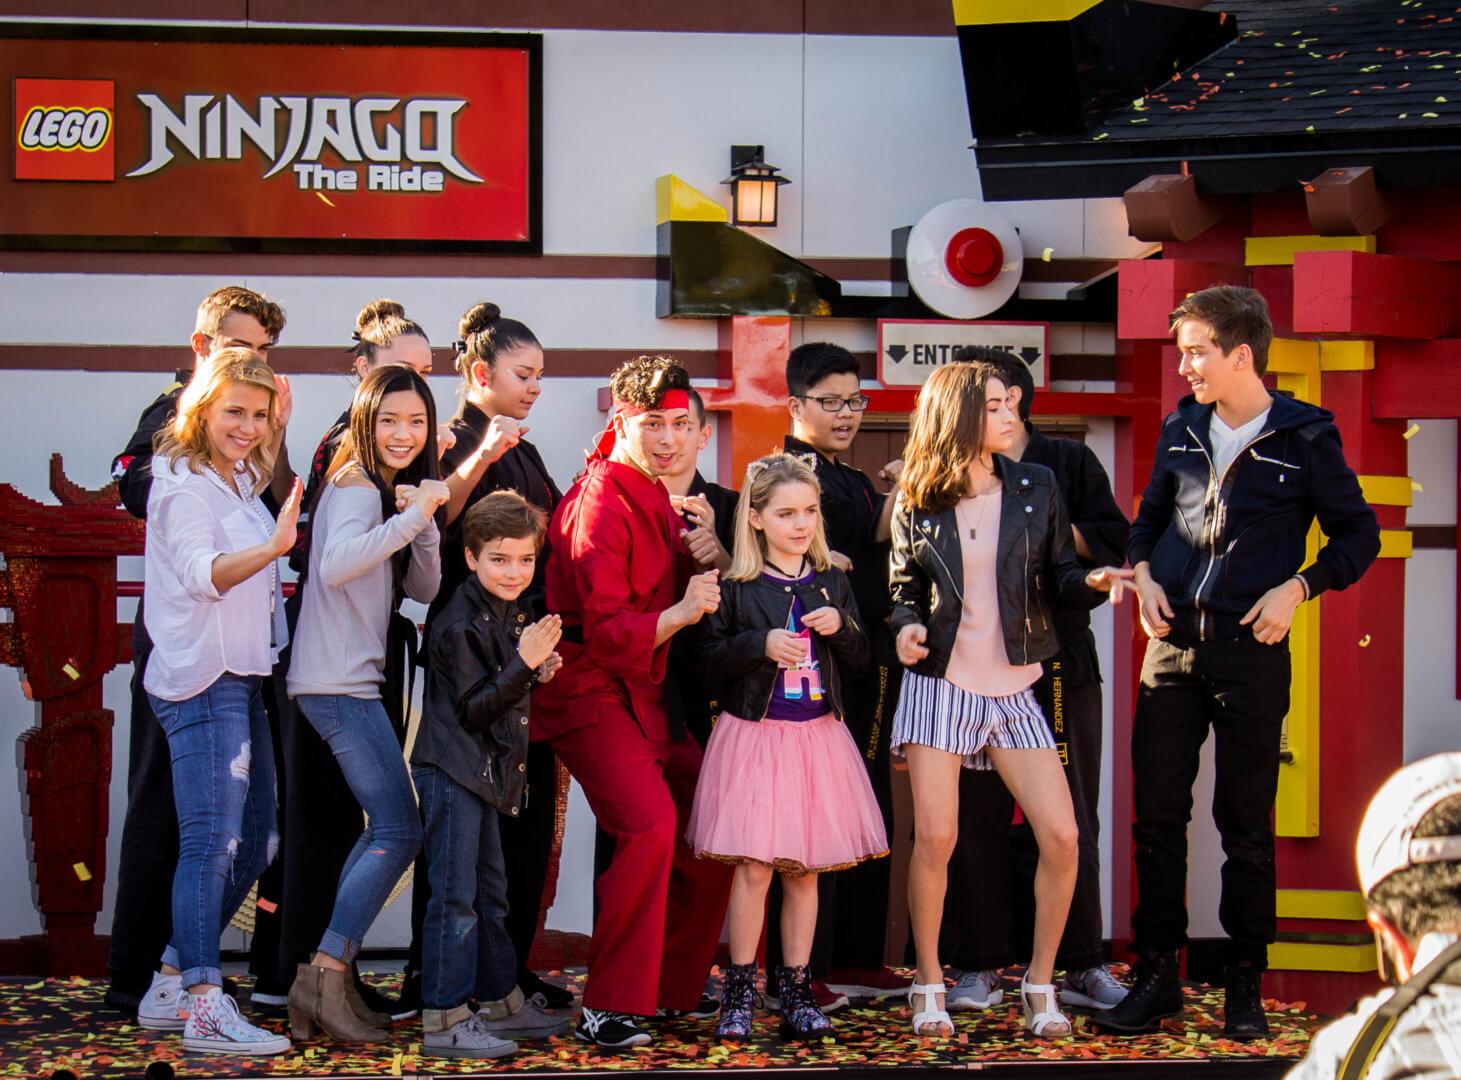 LEGO NINJAGO World grand opens at LEGOLAND Florida with Fuller